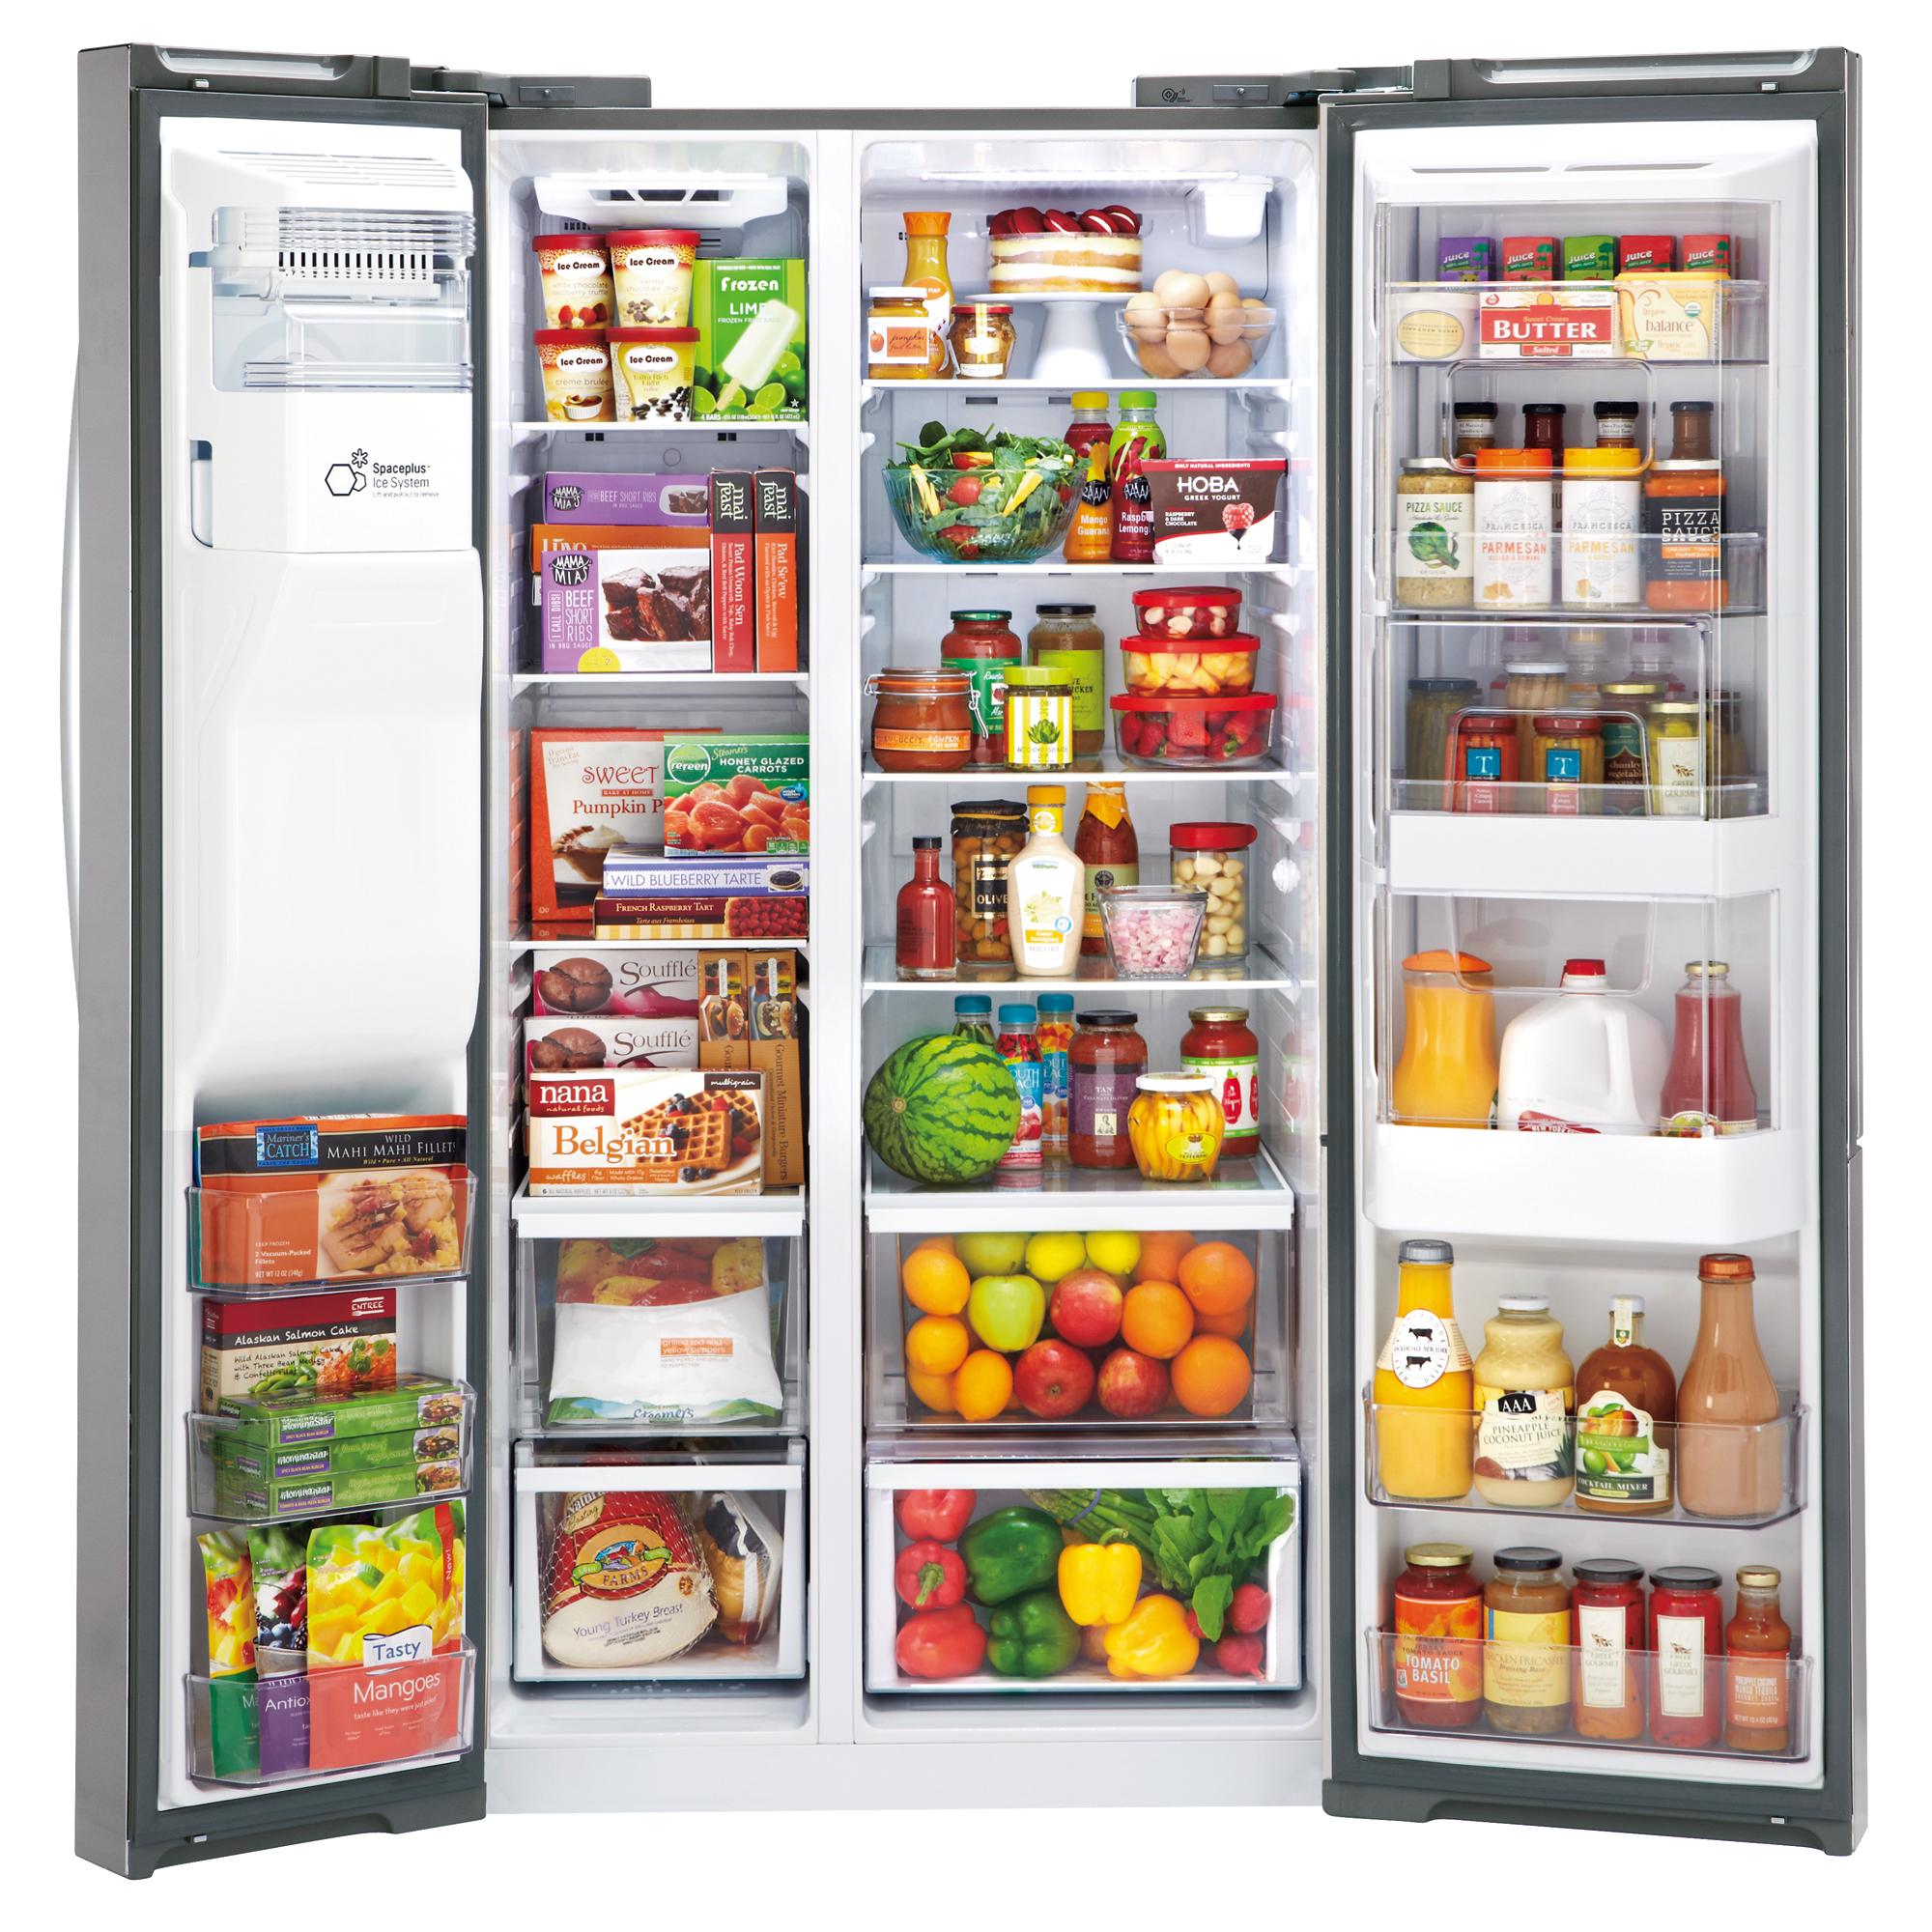 LG LSXS26366S 26.1 cu.ft. Ultra Large Capacity Side-by-Side Refrigerator w/Door-in-Door®